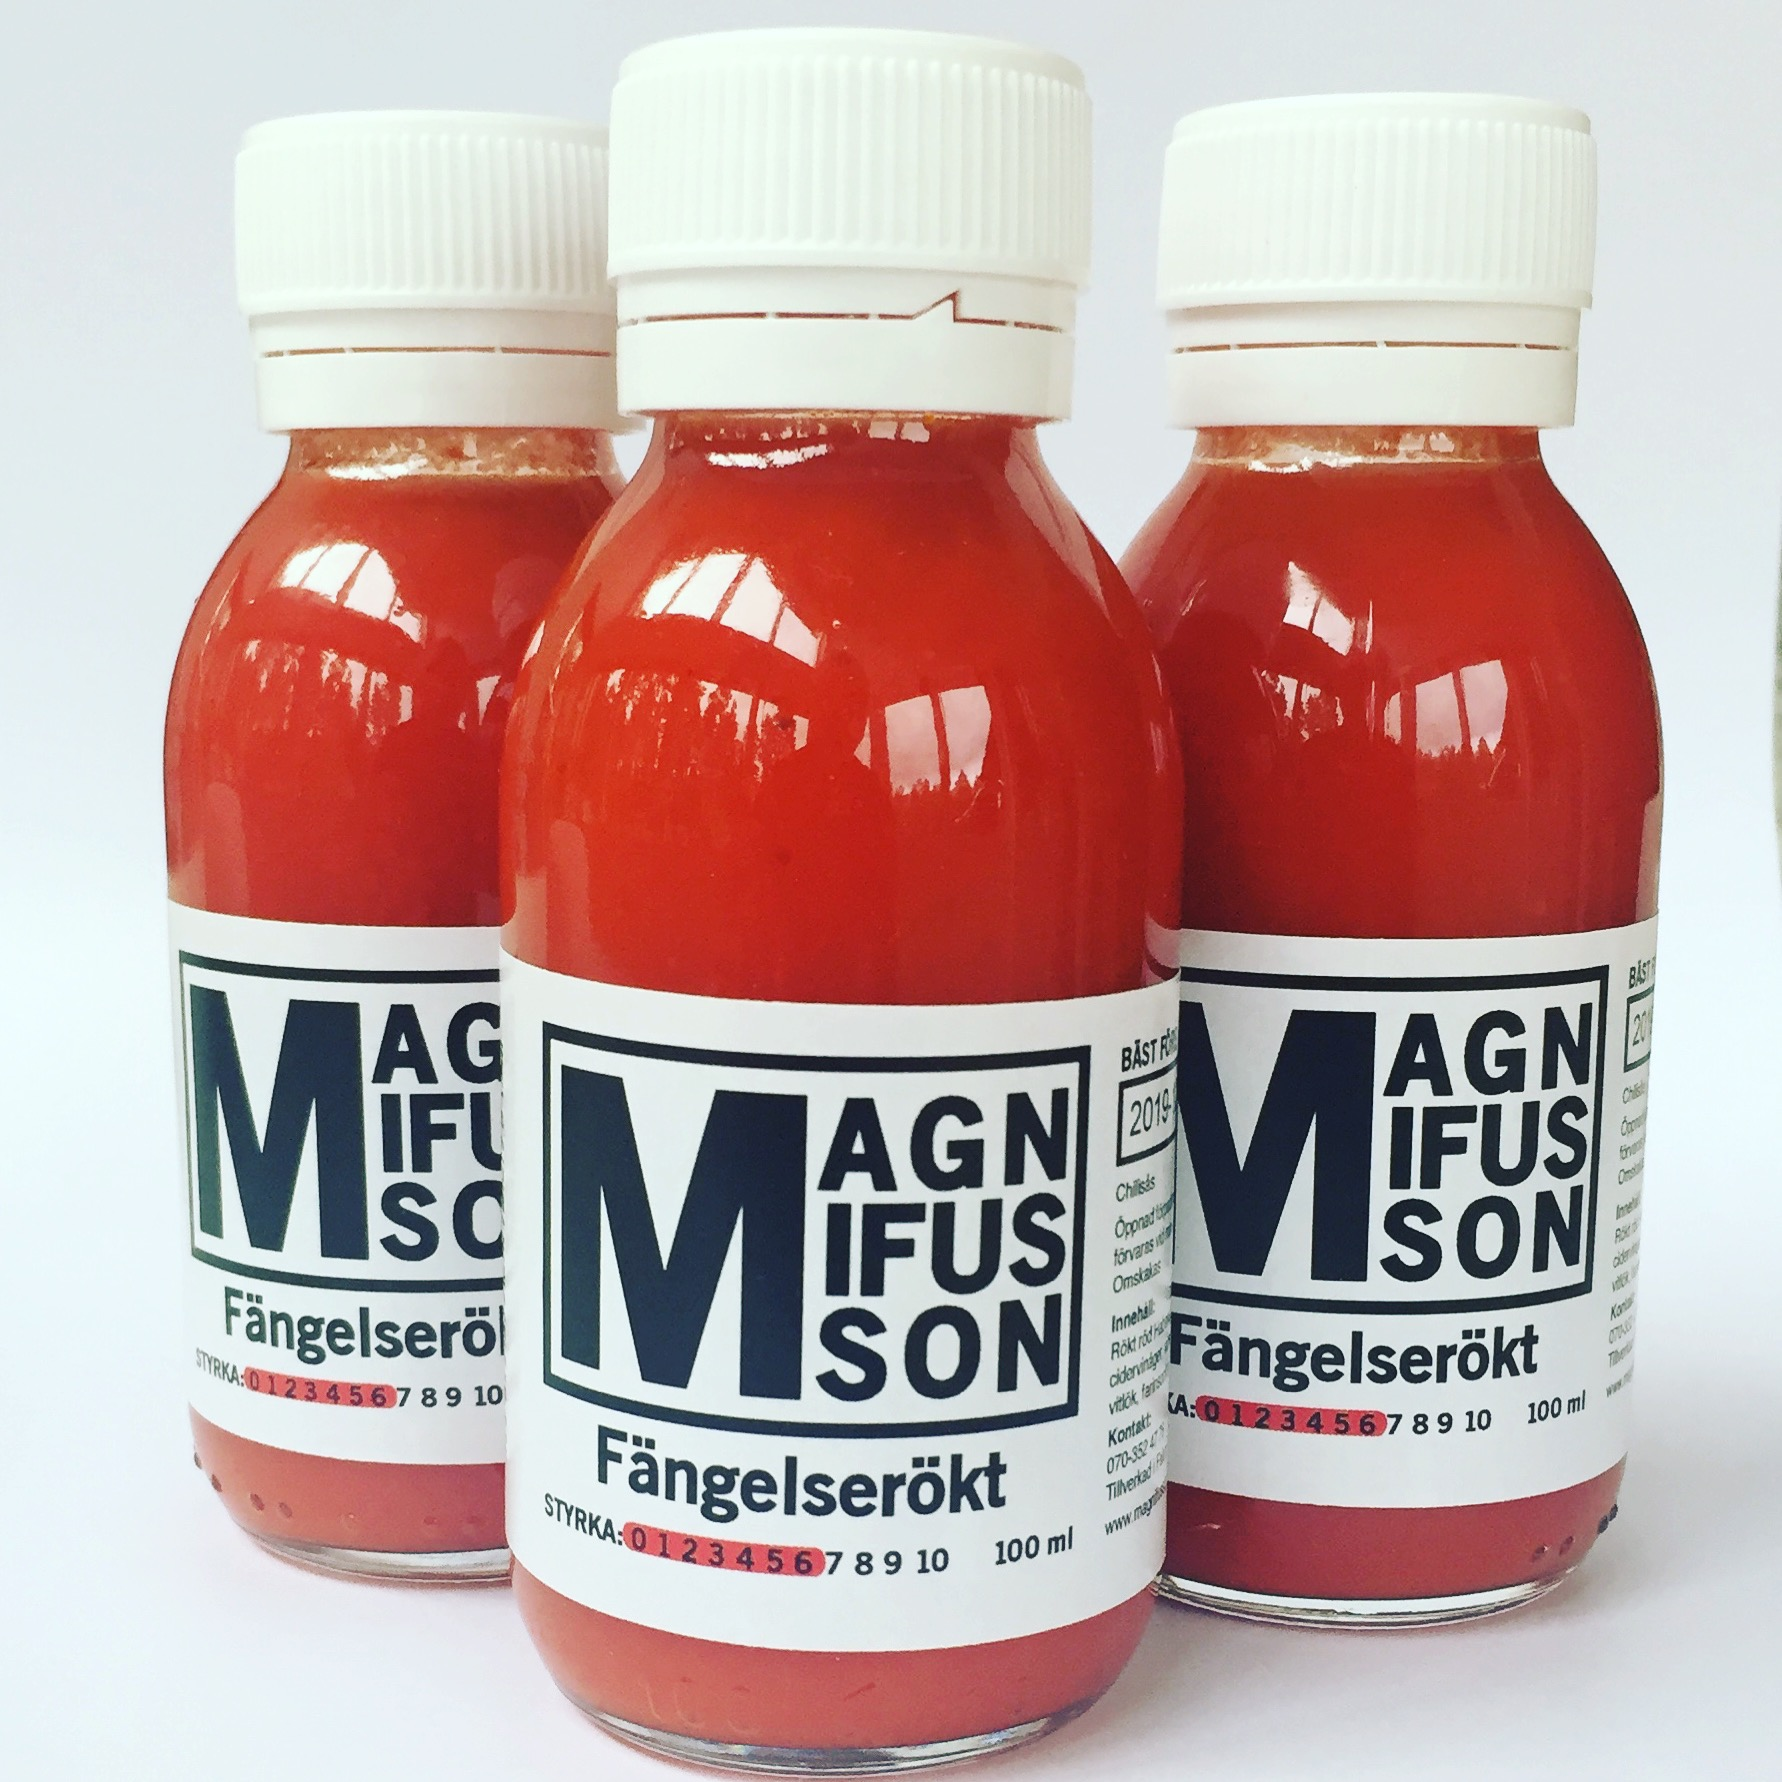 Magnifusson